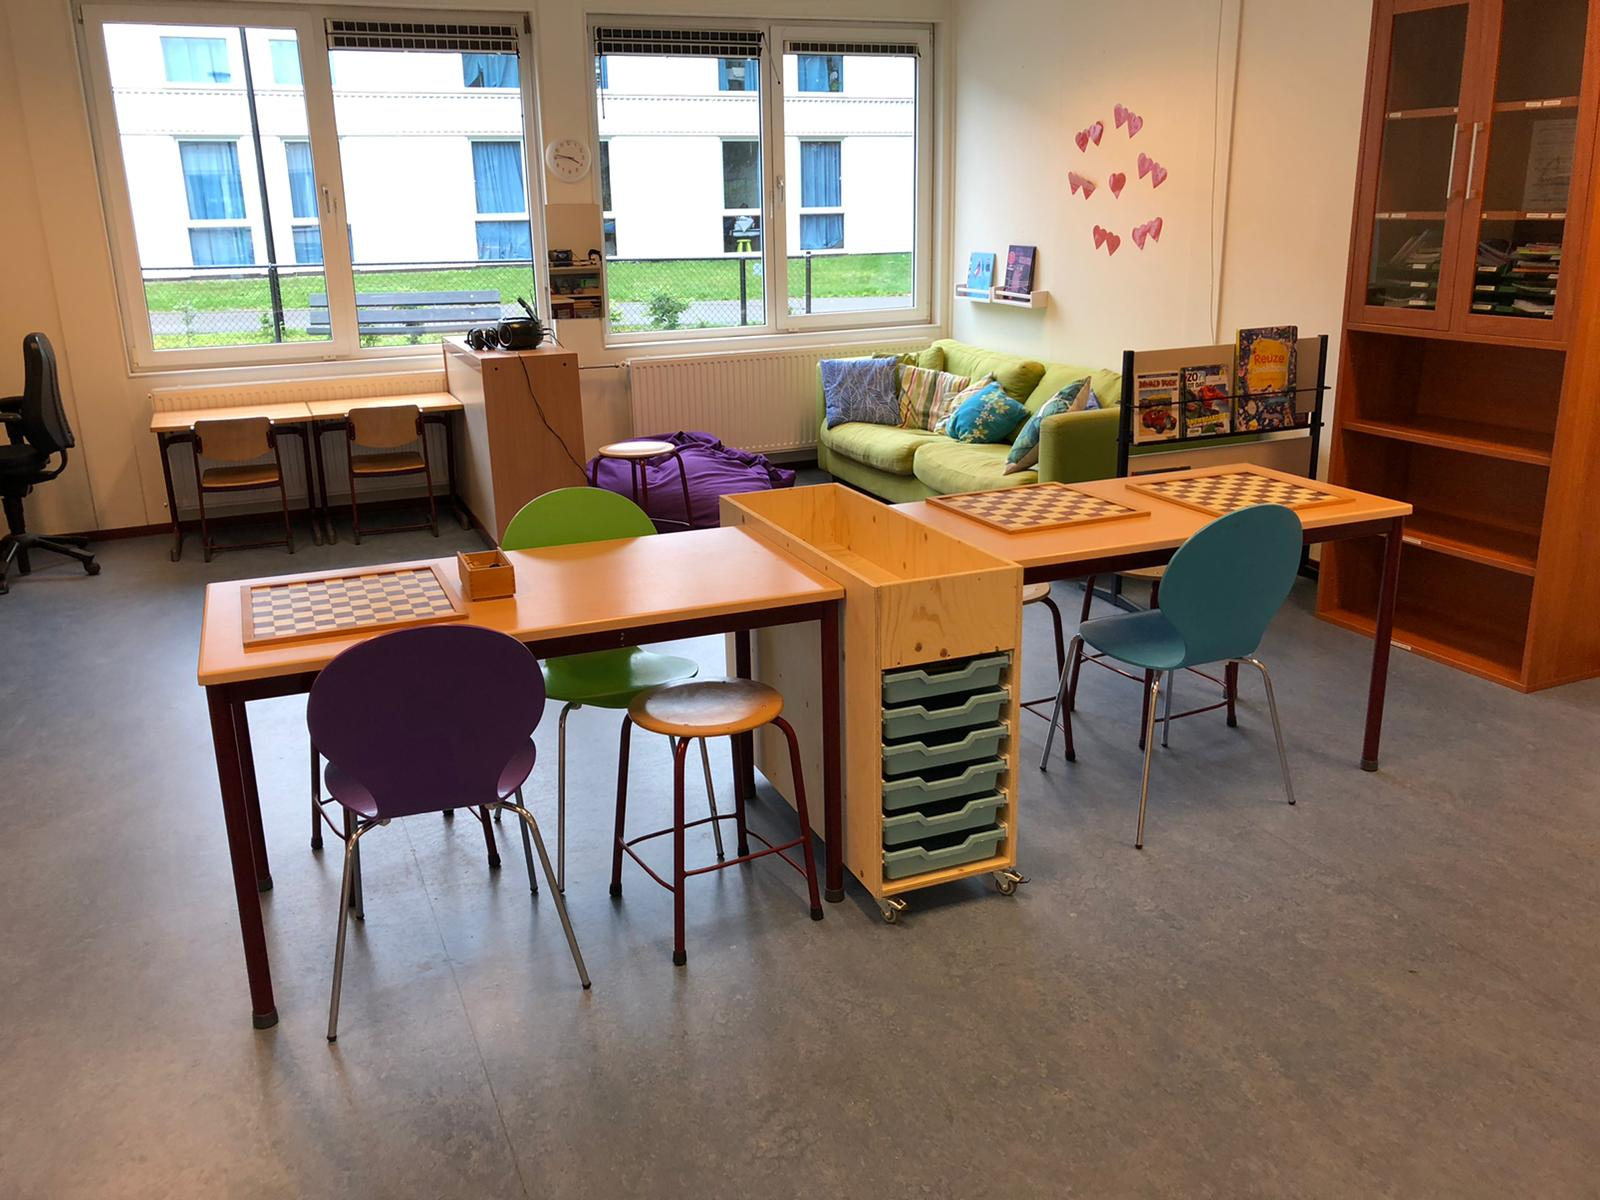 Interieur AZC school De Waaier